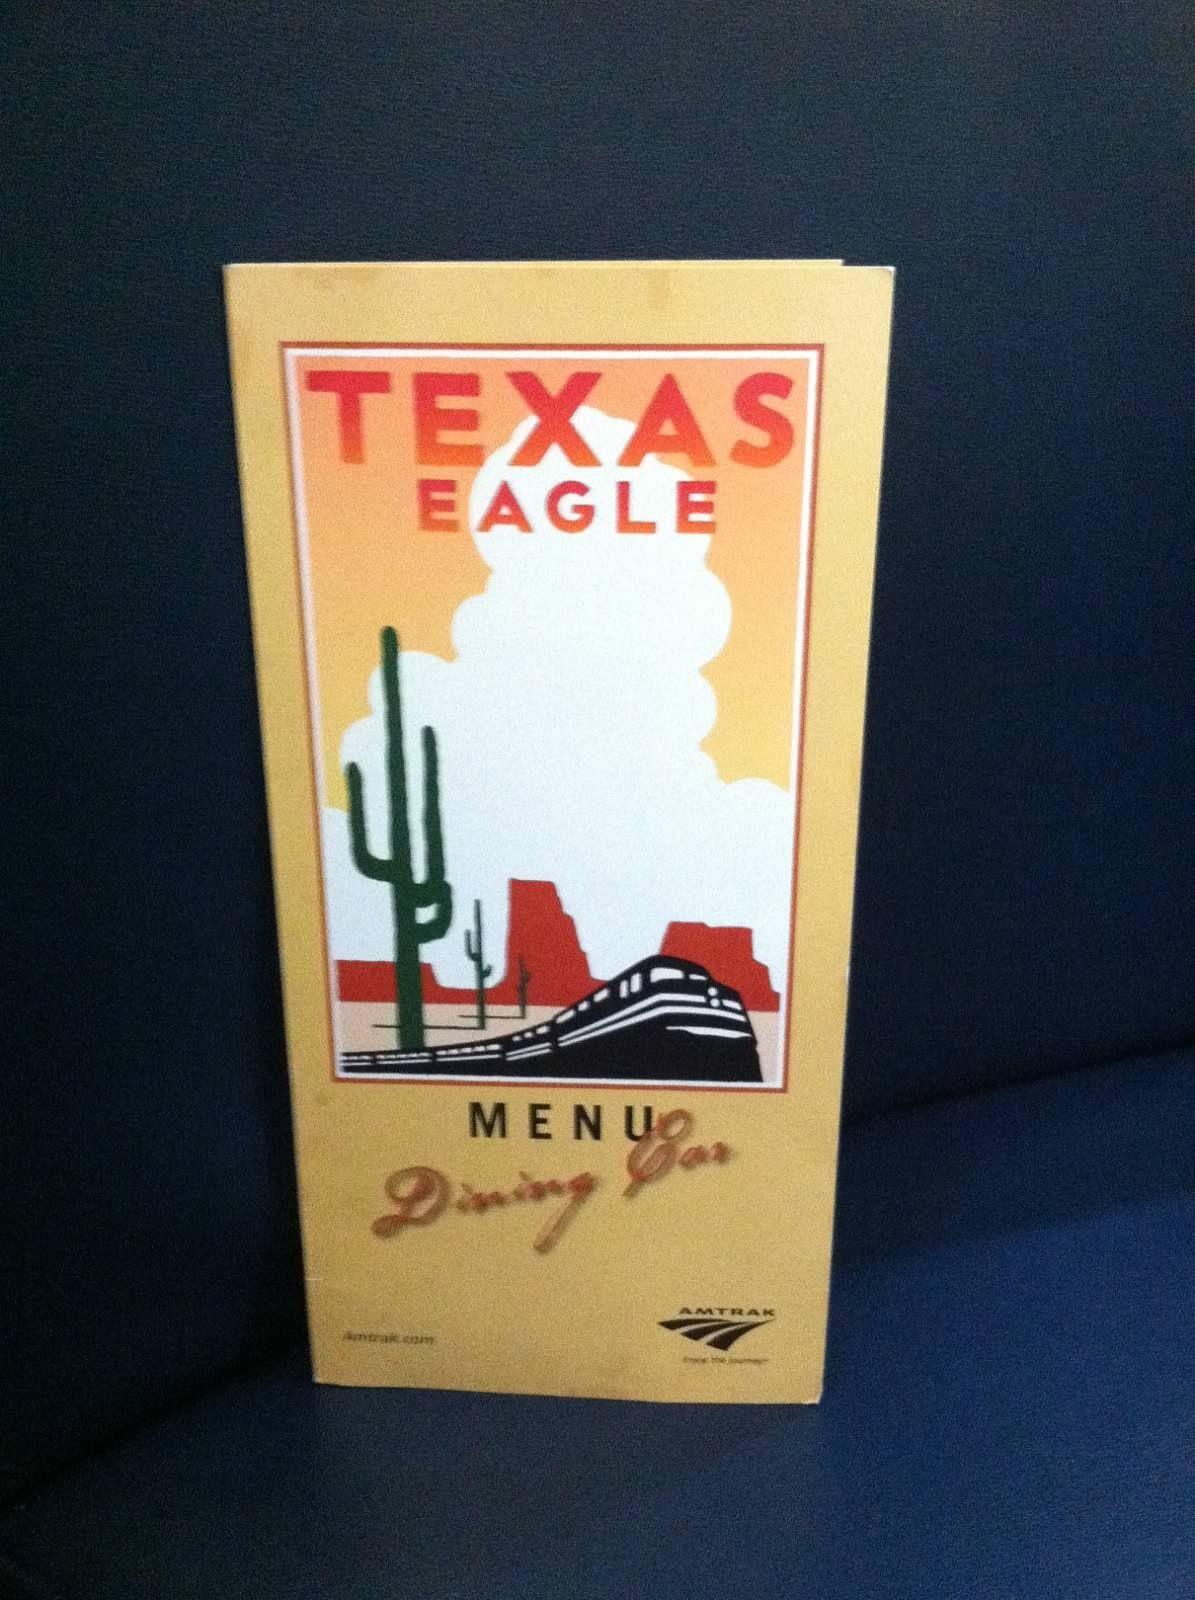 Pin by Debbie Forsgren on Amtrak Texas Eagle Book cover